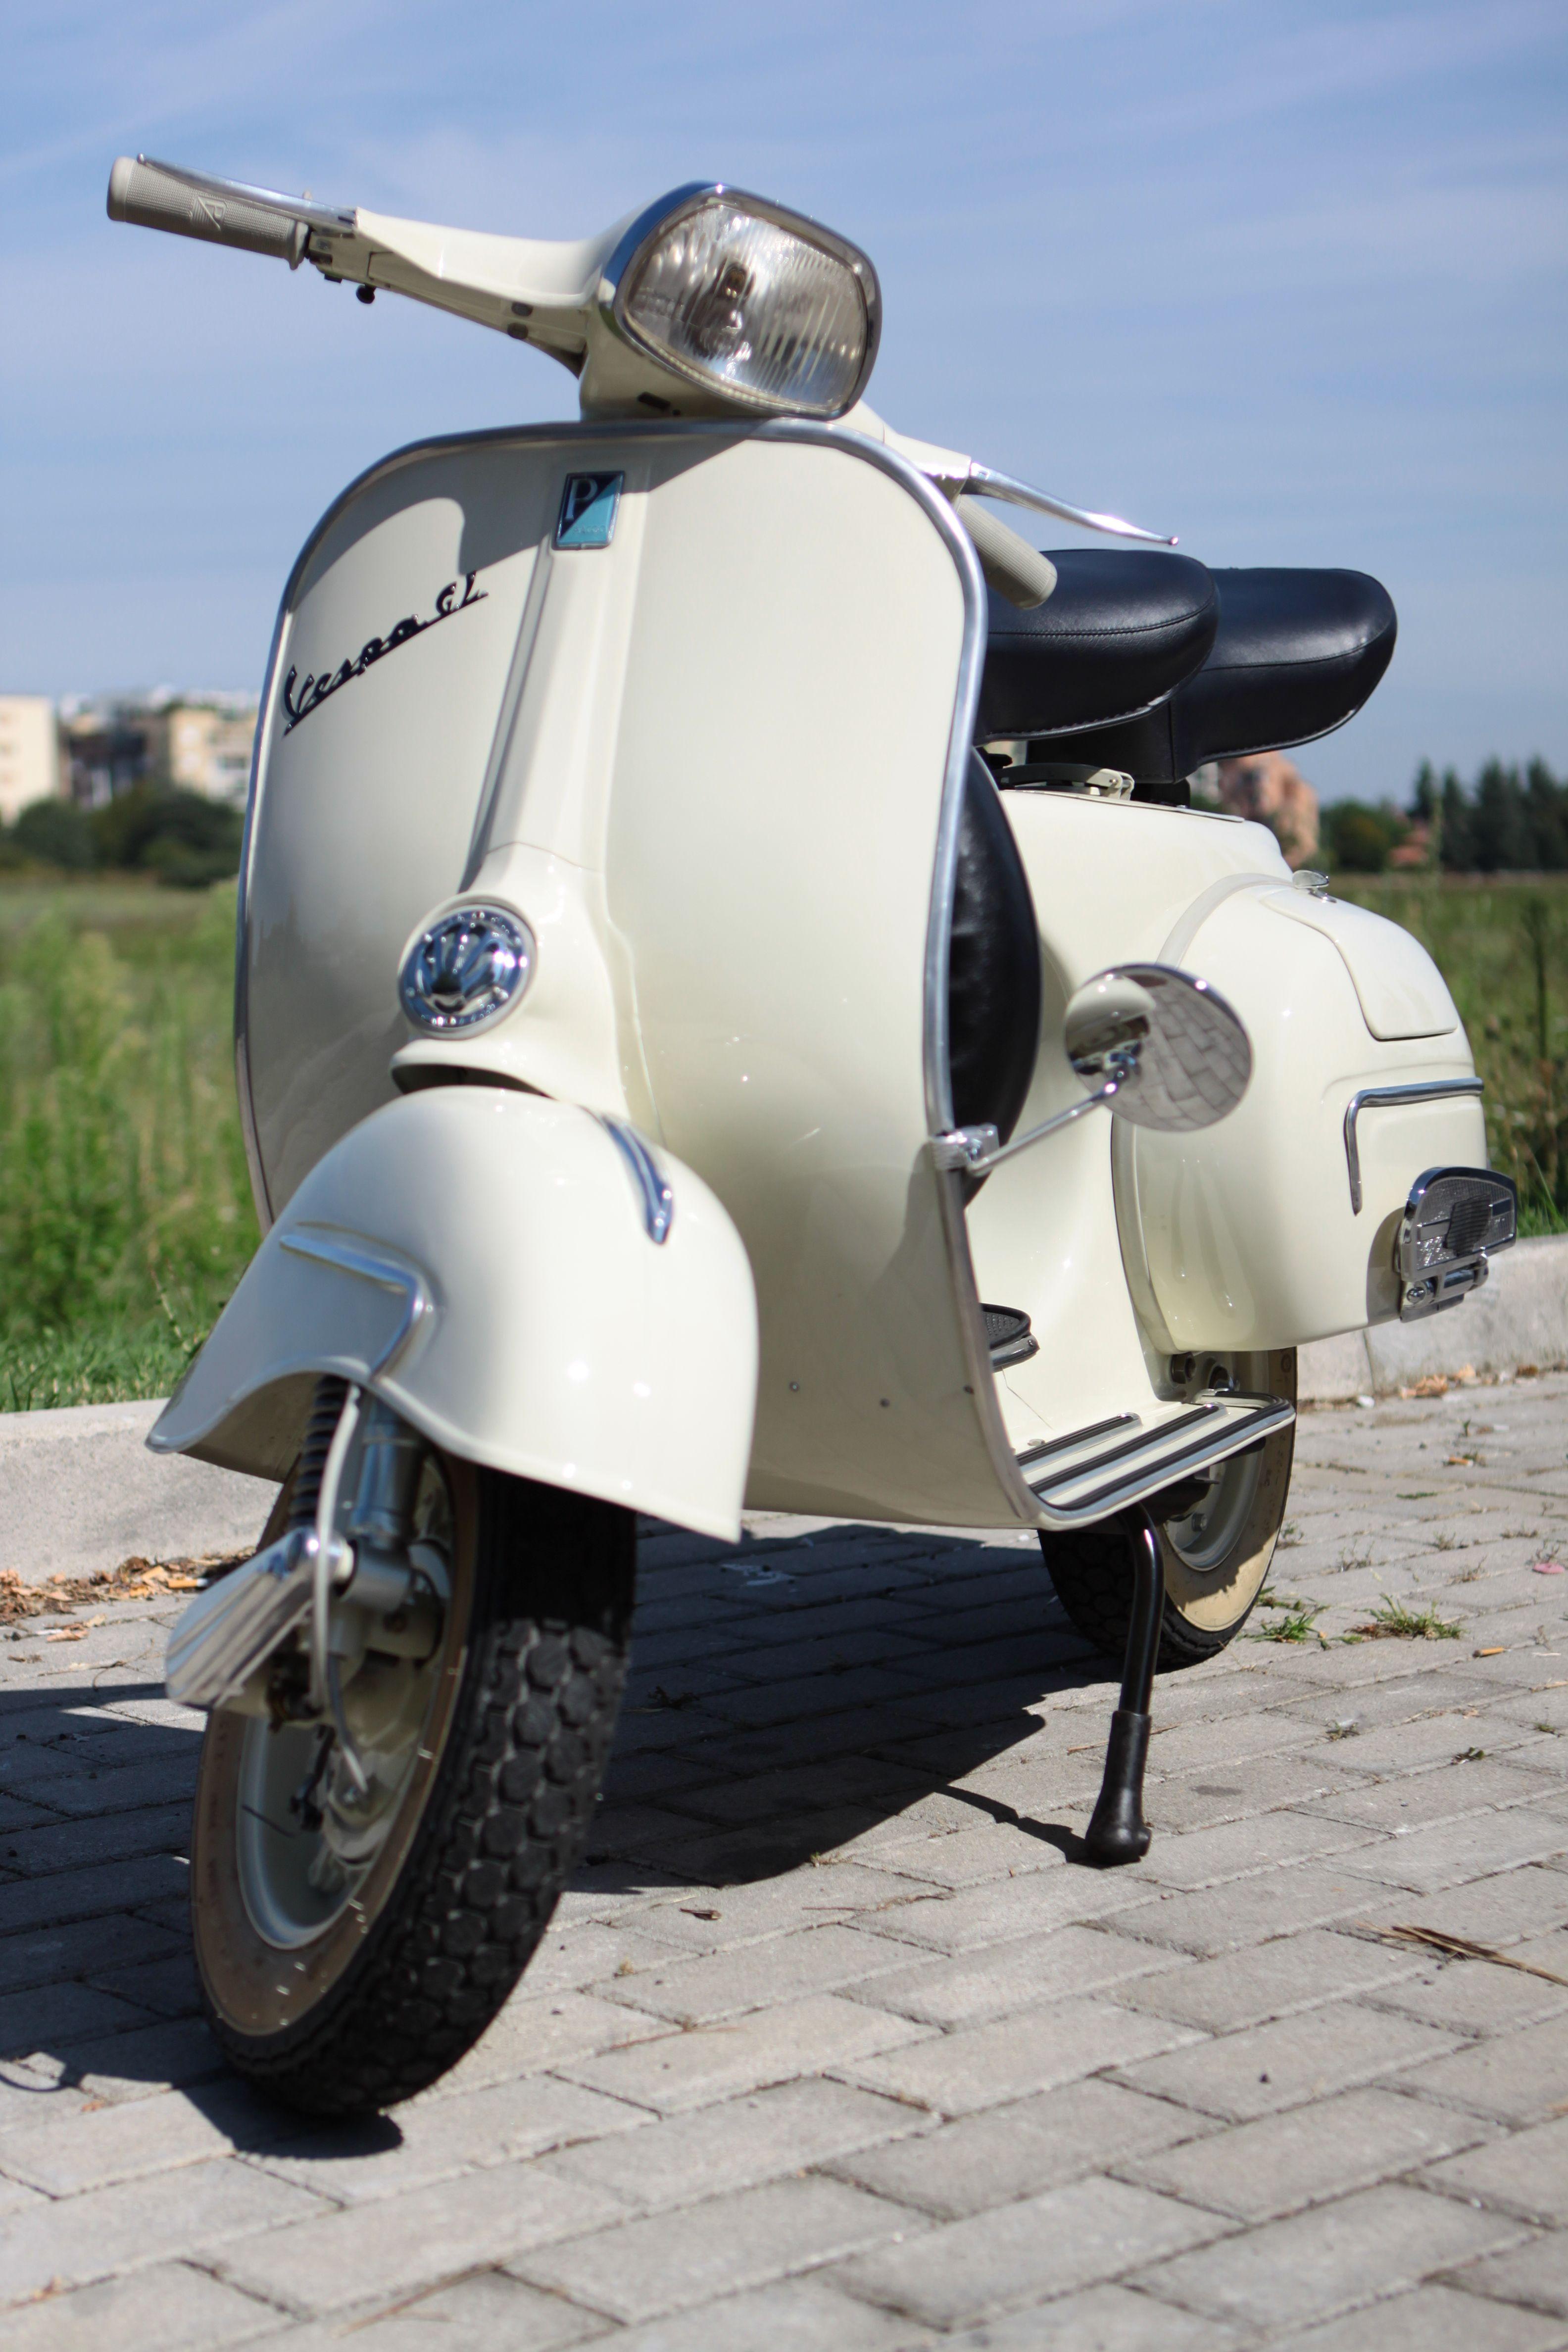 vespa gl 150 - motor bike service | vespa | pinterest | vespa